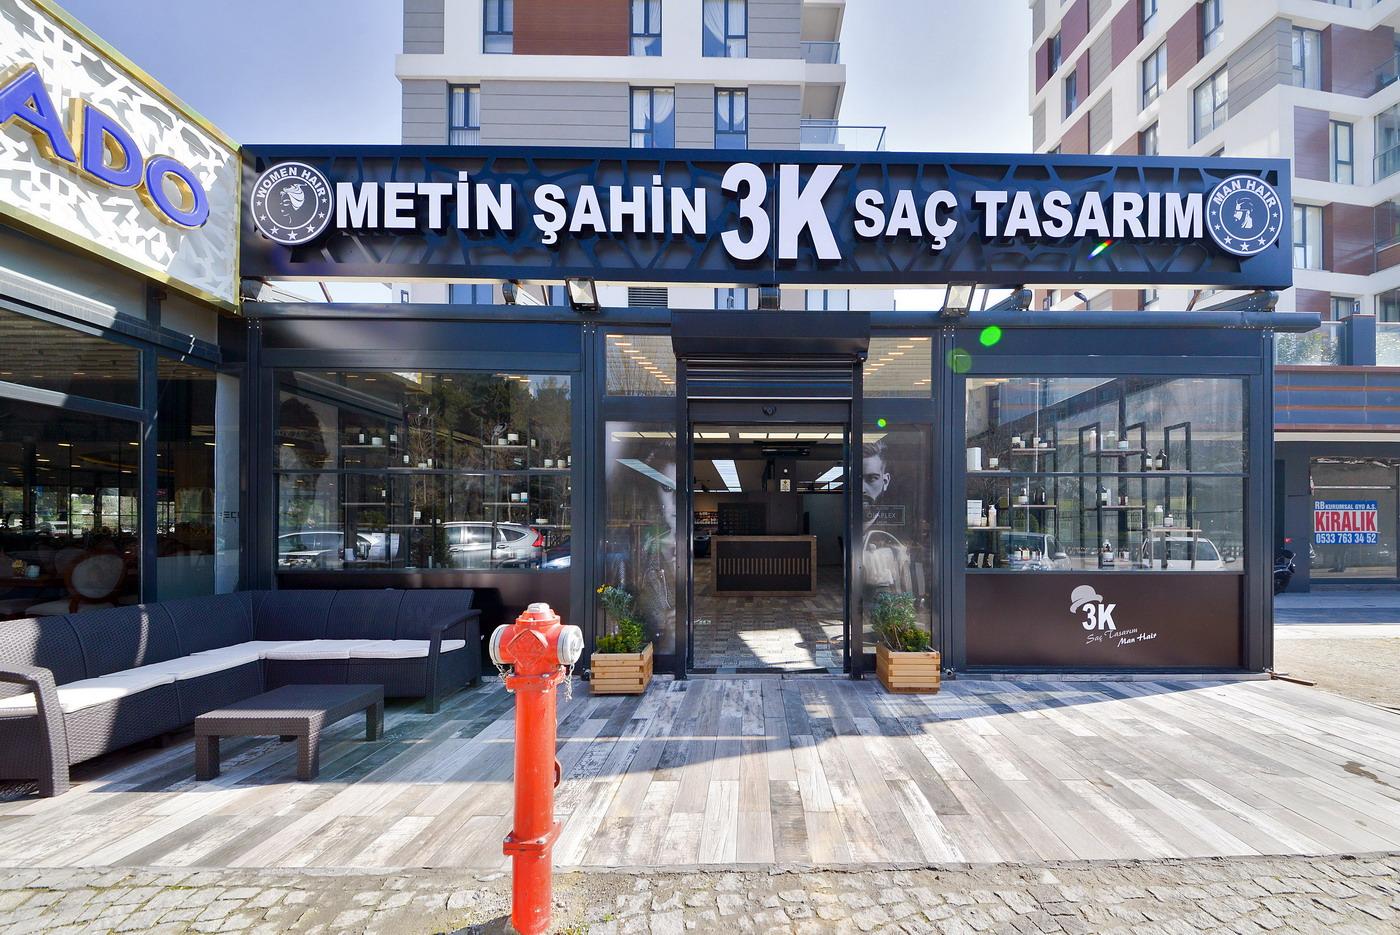 İstanbul - 3K West Side